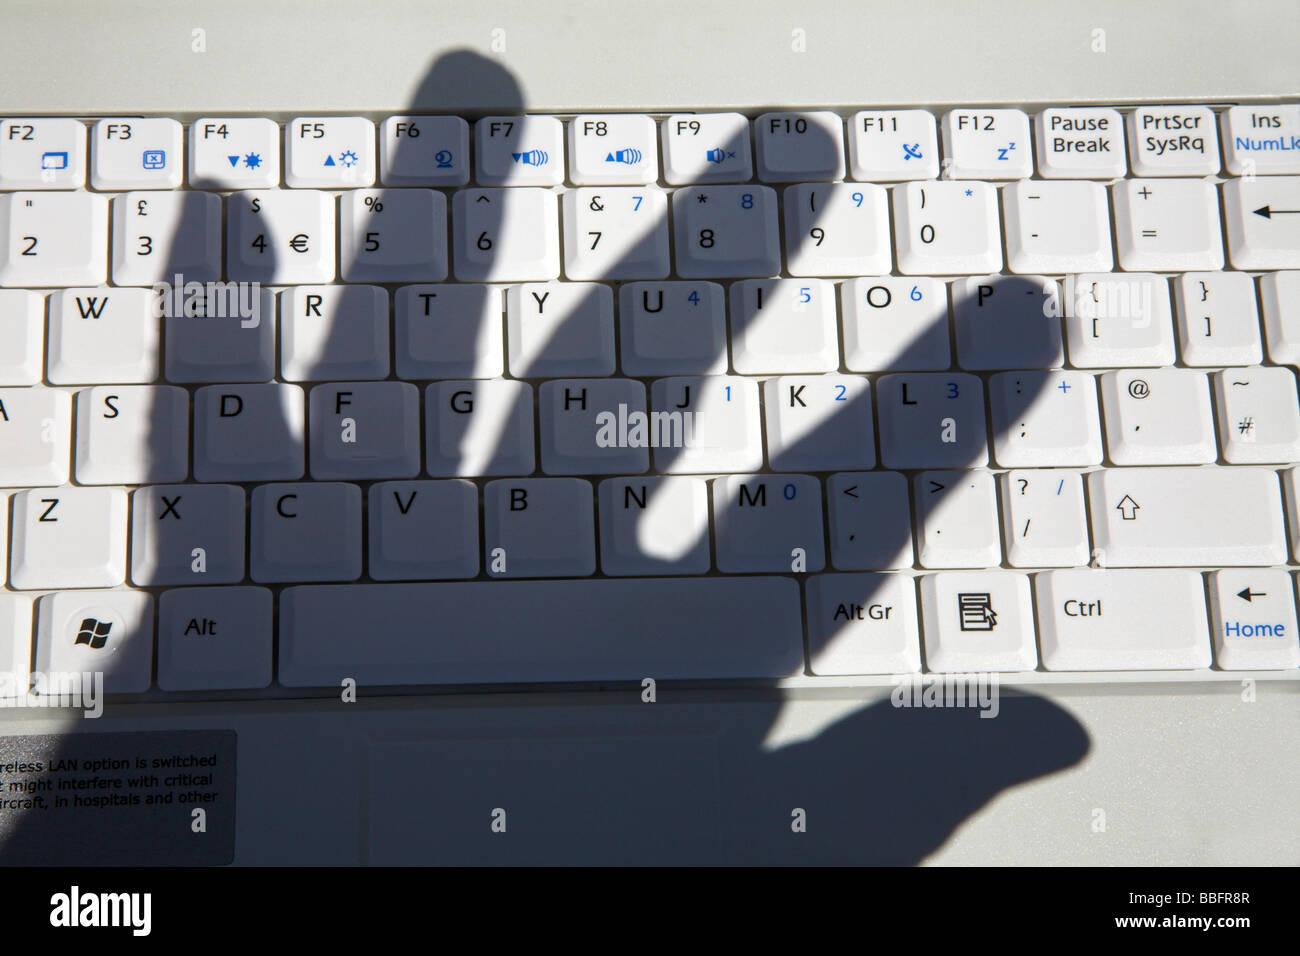 Shadow of hand over computer keyboard. - Stock Image